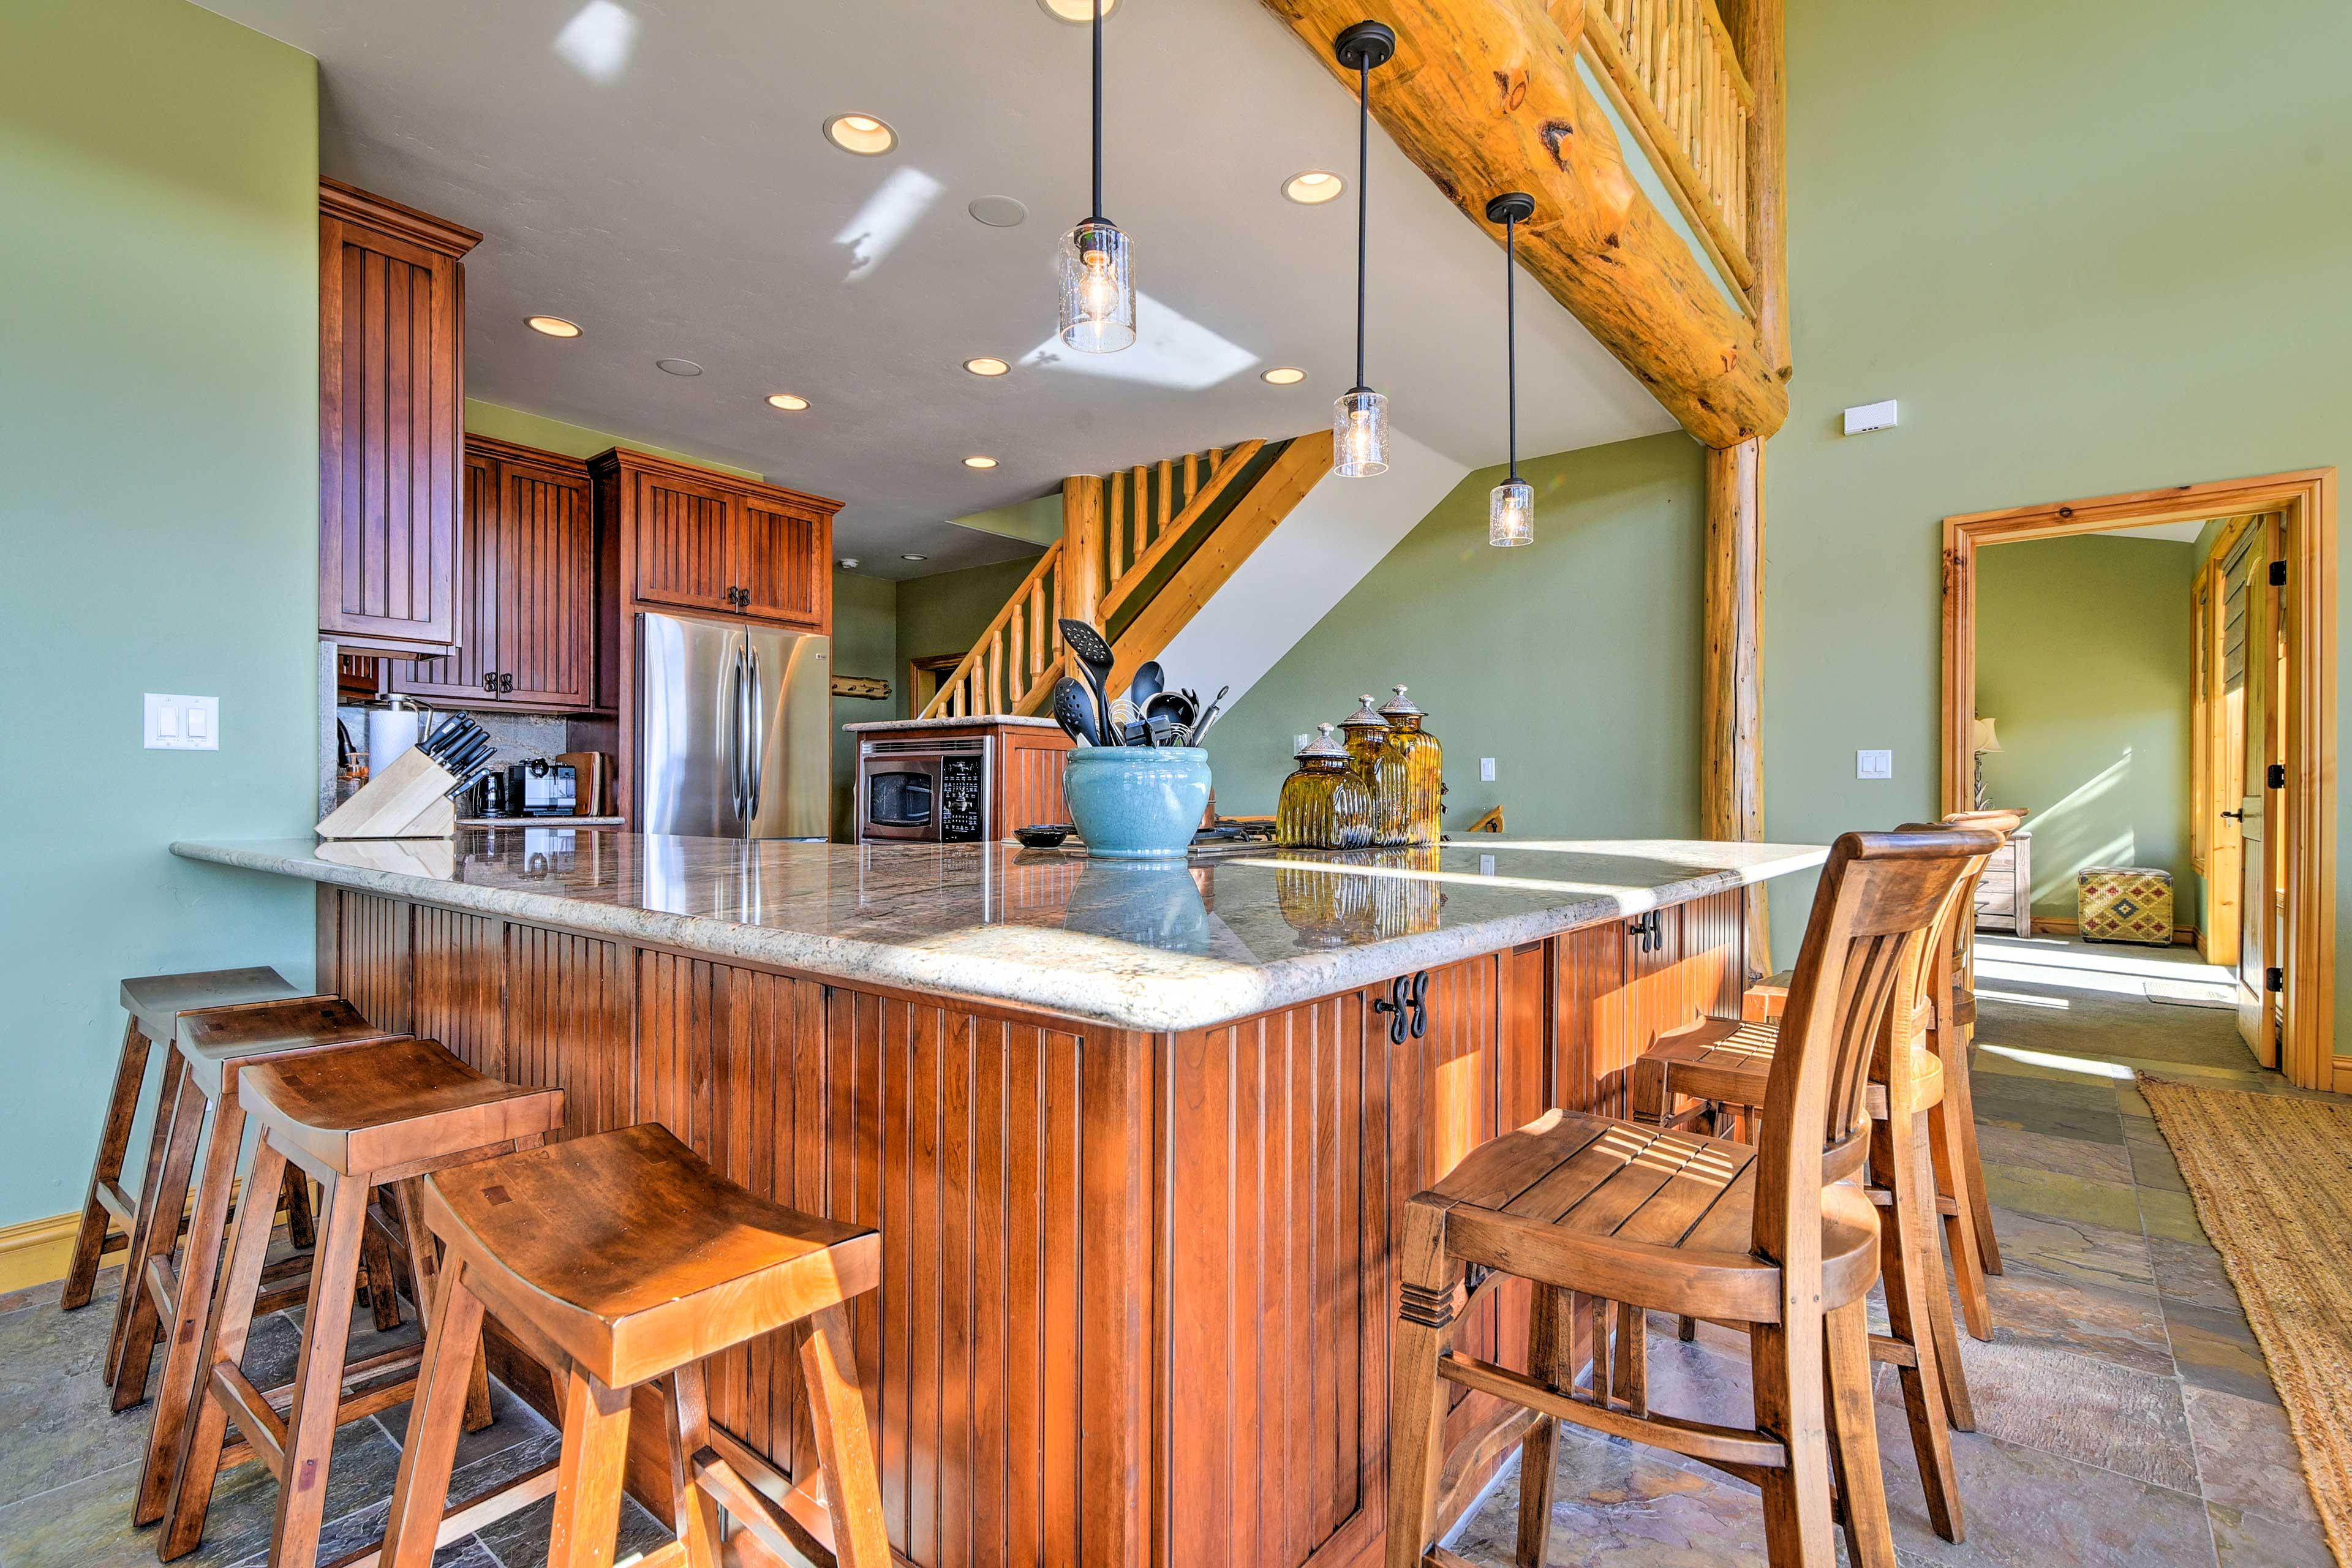 Kitchen | Fully Equipped | Wraparound Breakfast Bar